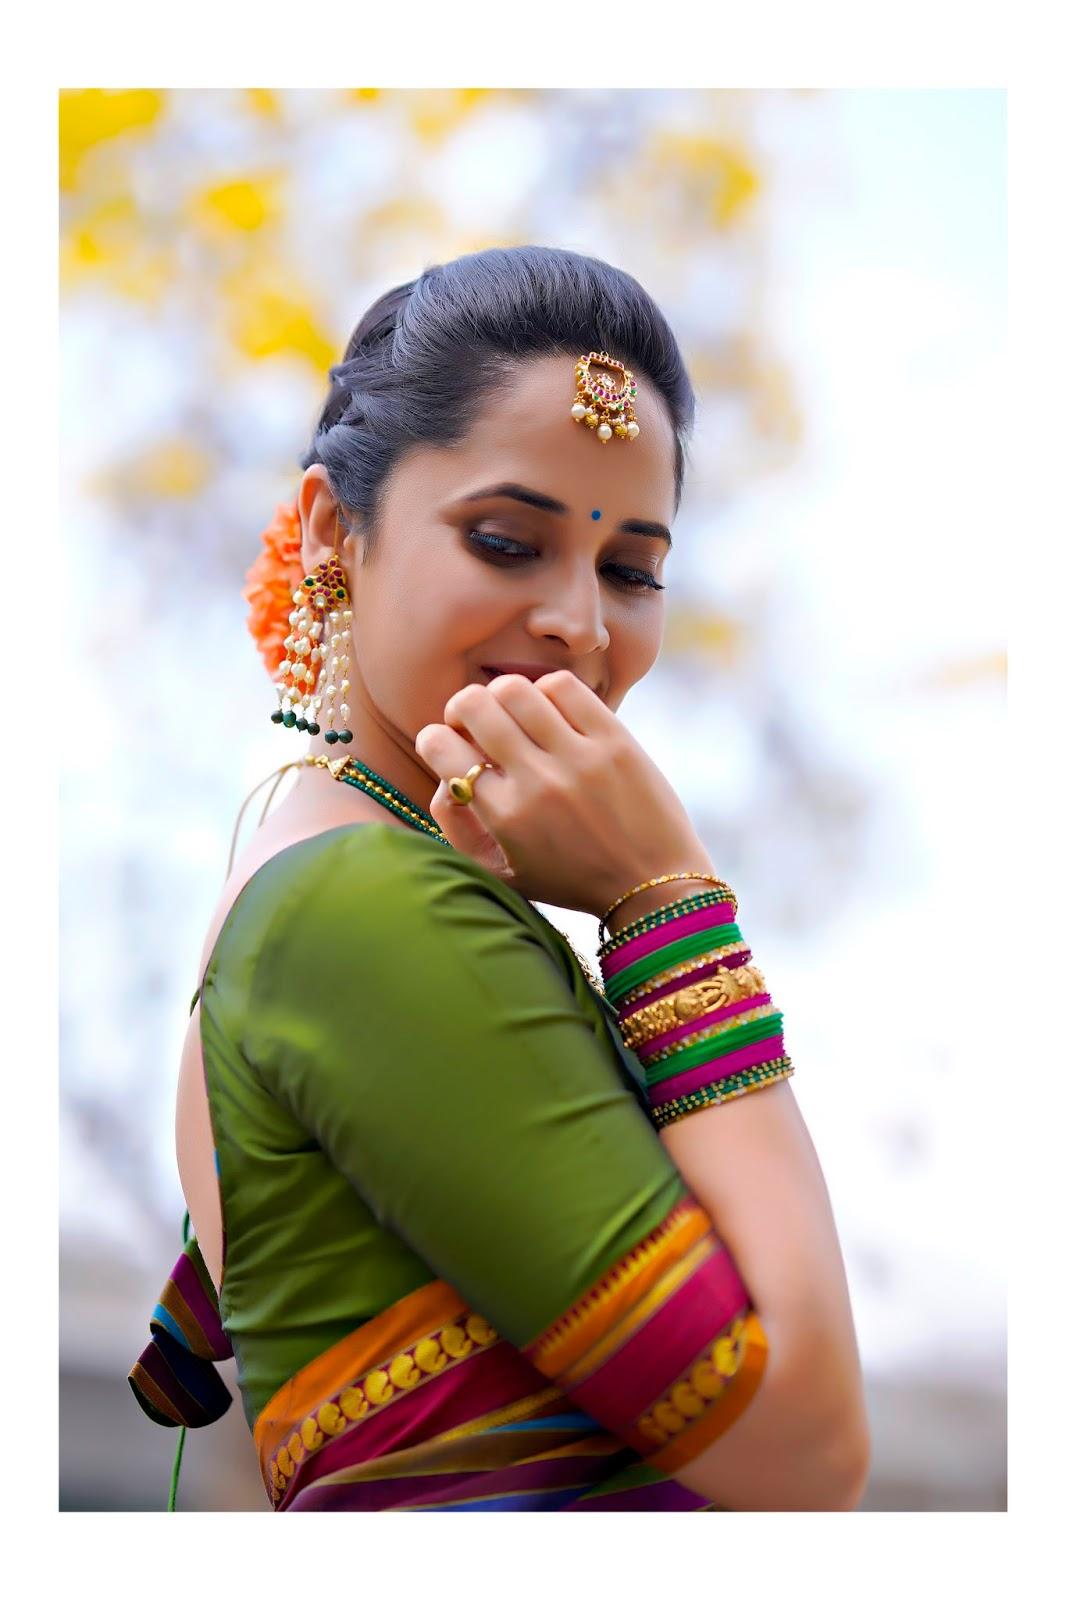 Telugu Actress Anasuya Bharadwaj Beautiful In Saree Pics Latest Indian Hollywood Movies Updates Branding Online And Actress Gallery